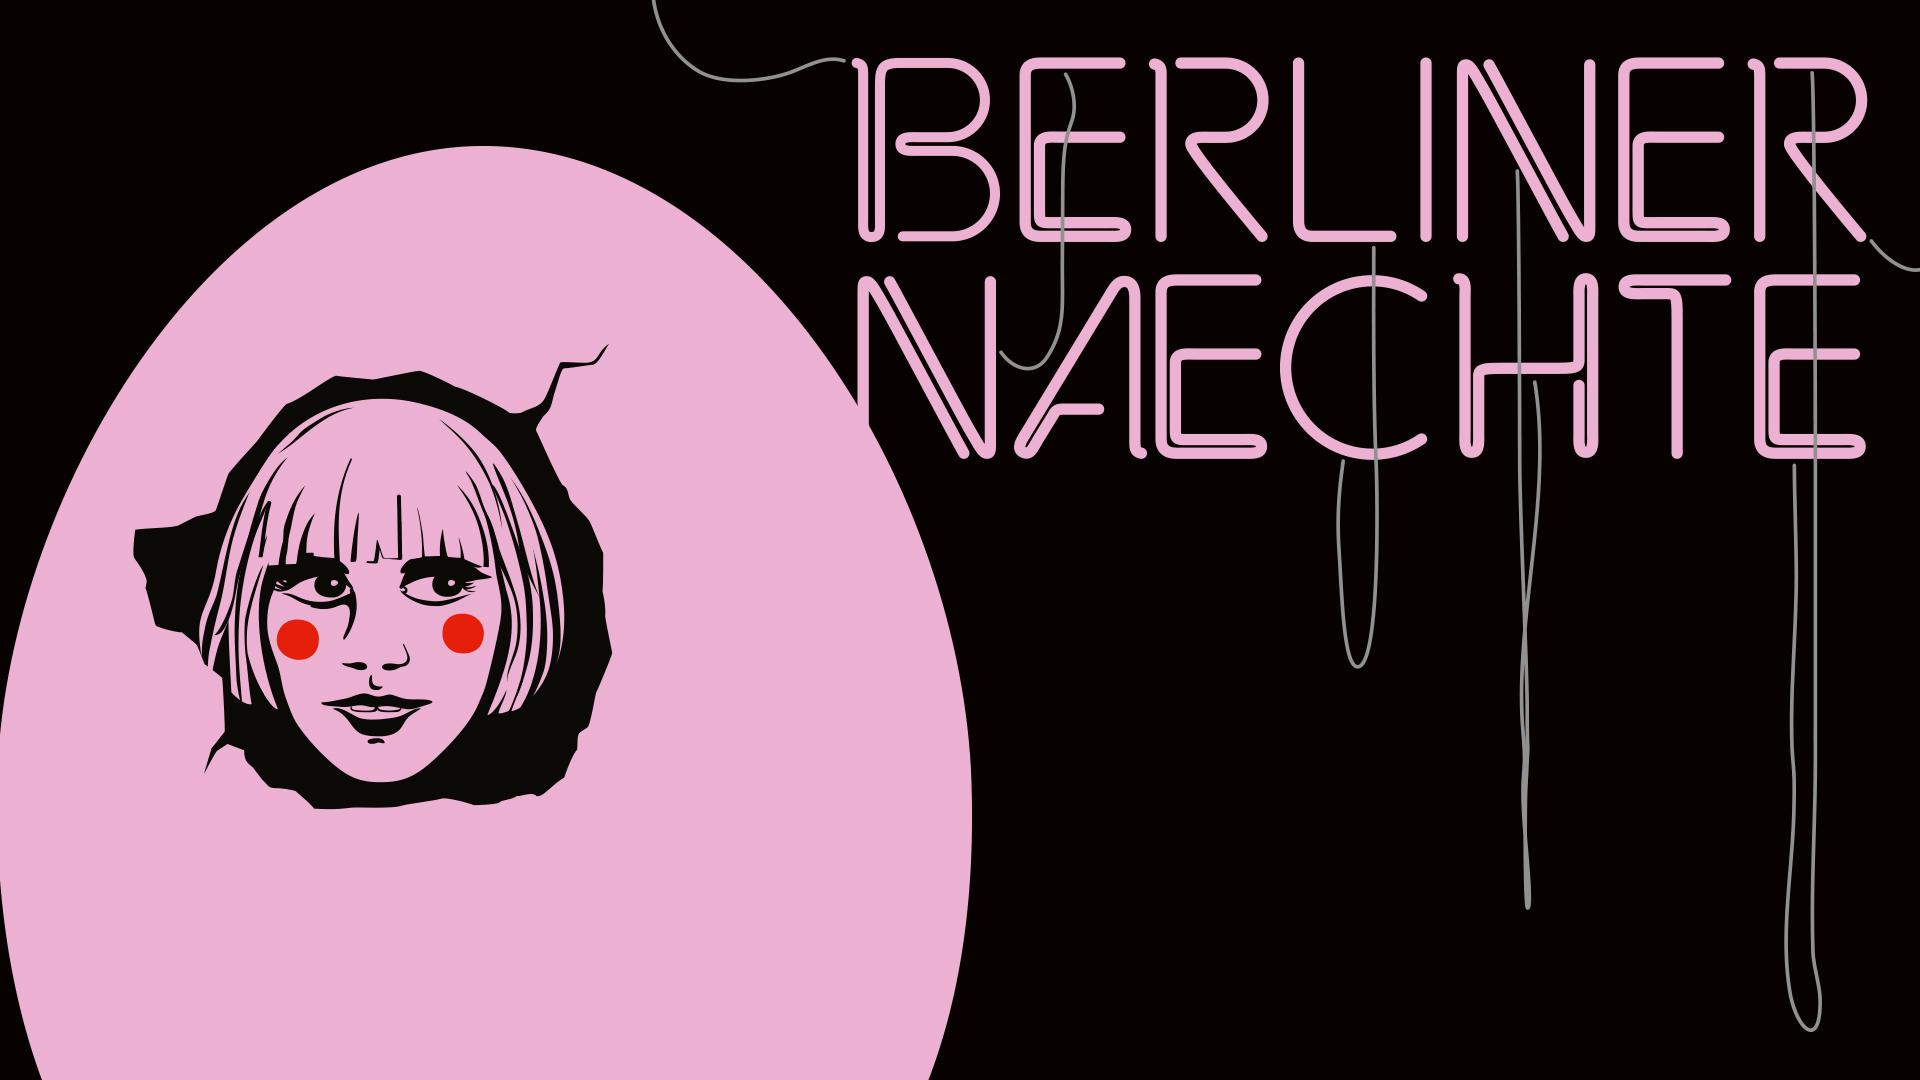 Berliner Naechte w/ Sebo K & Ruede Hagelstein